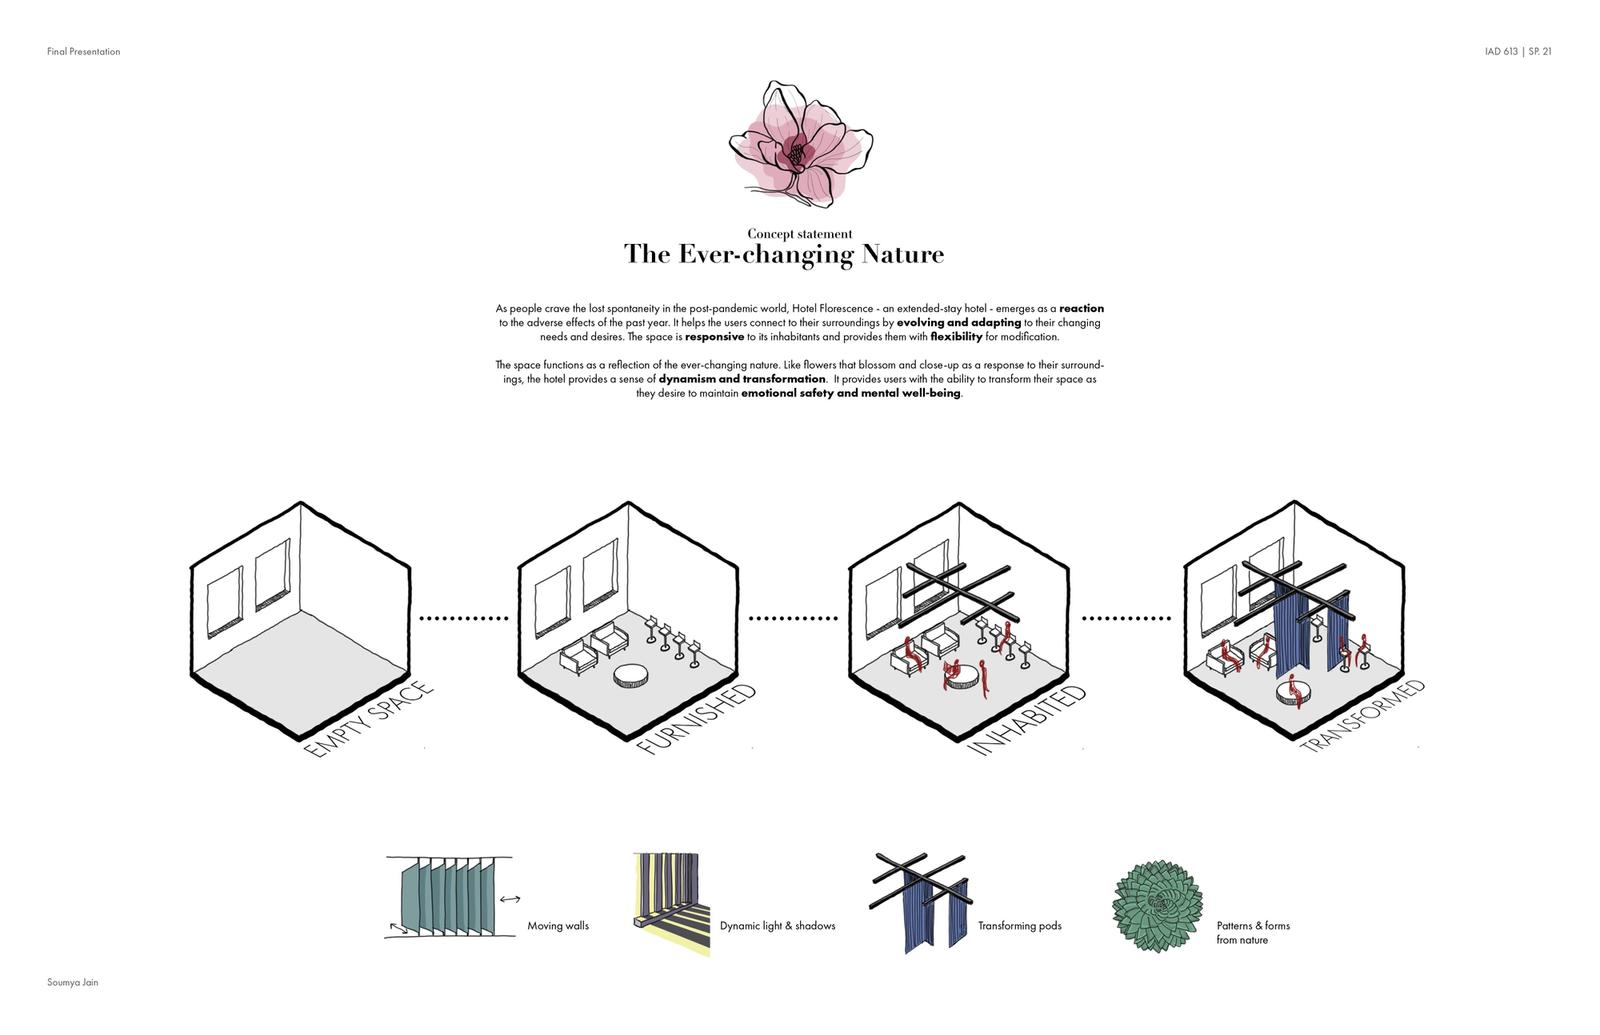 Hotel Florescence - Concept